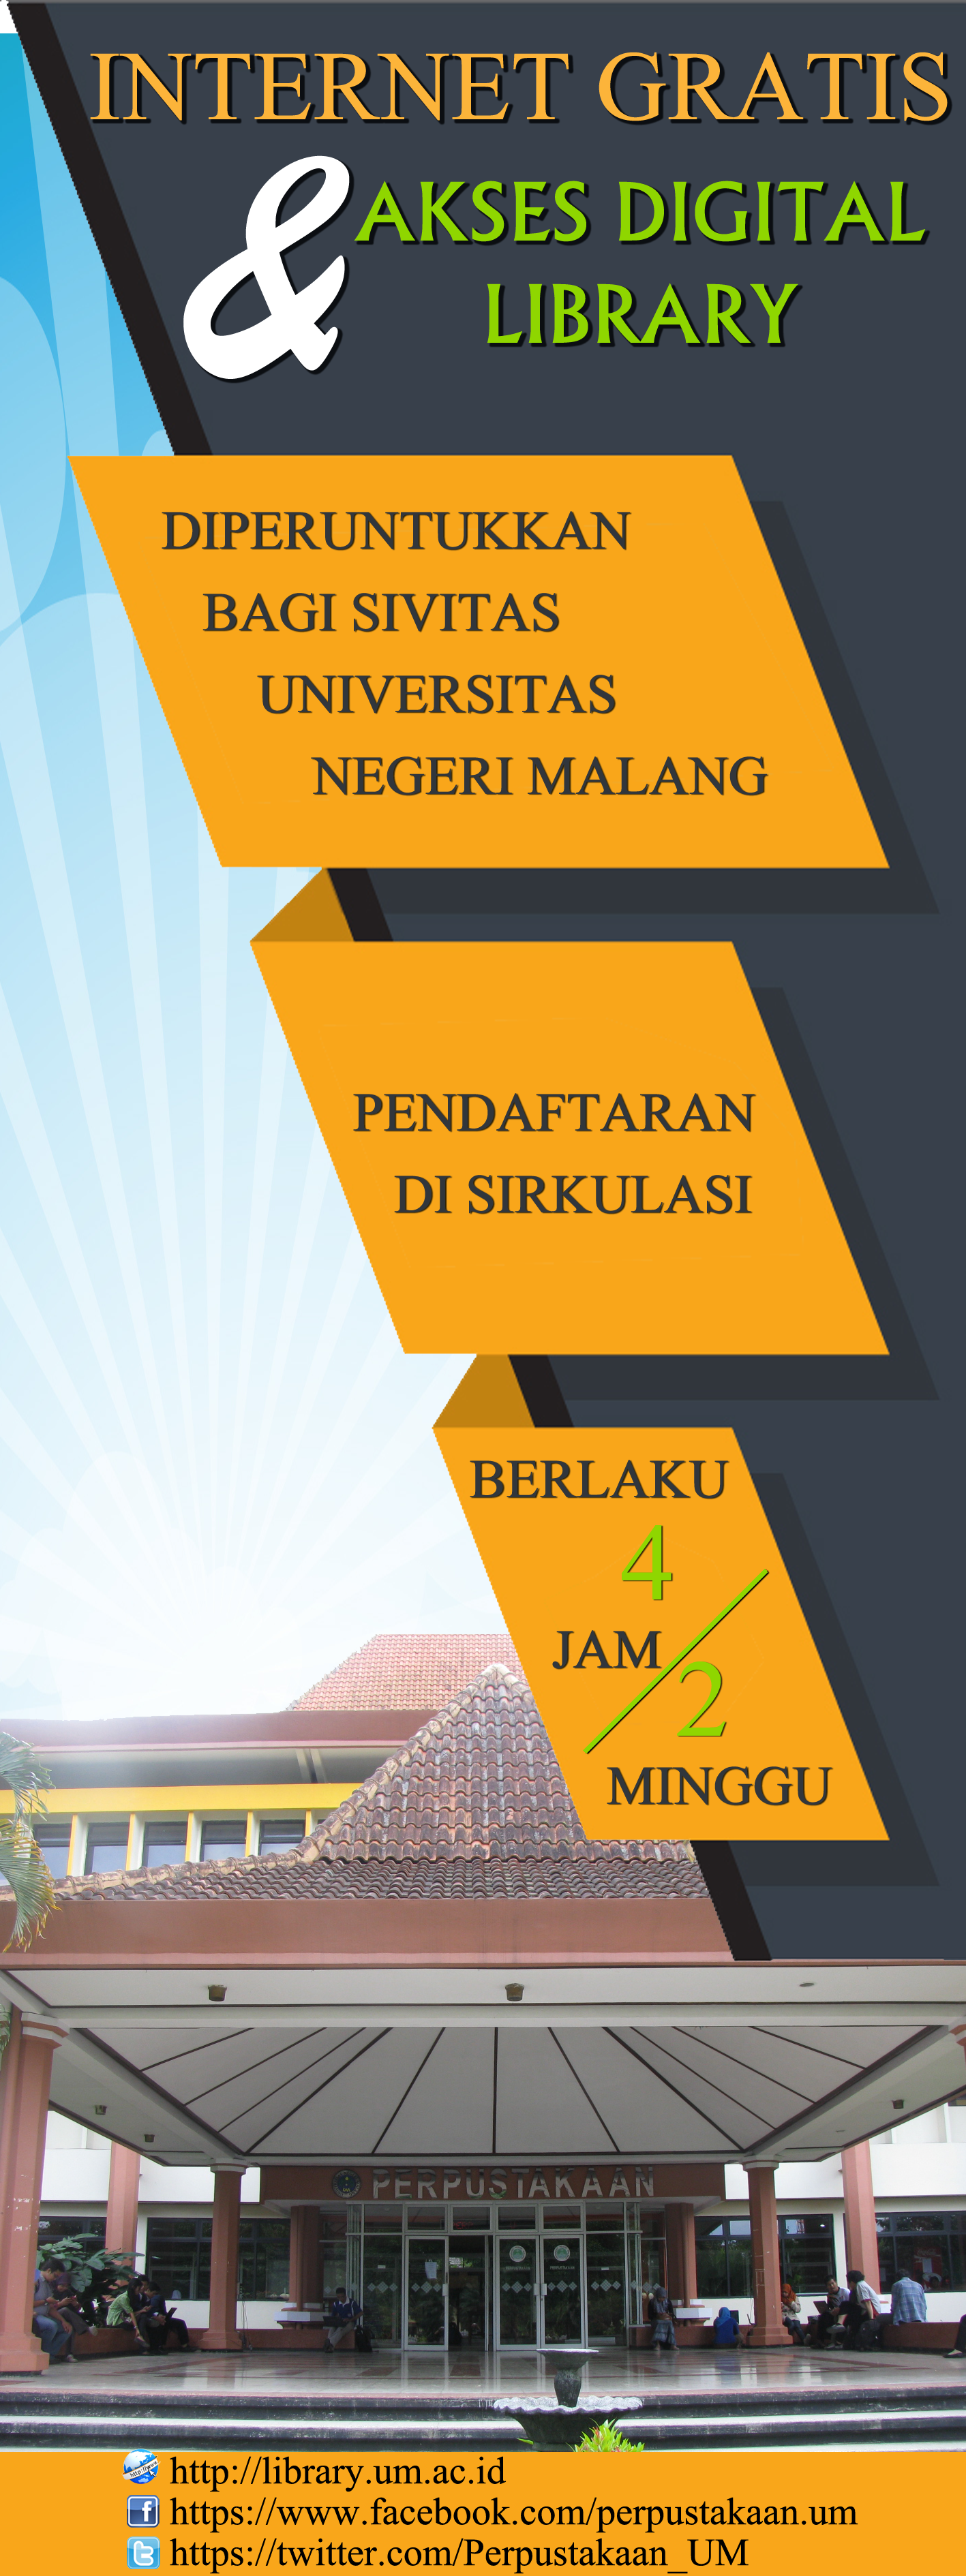 Internet Gratis Upt Perpustakaan Universitas Negeri Malang